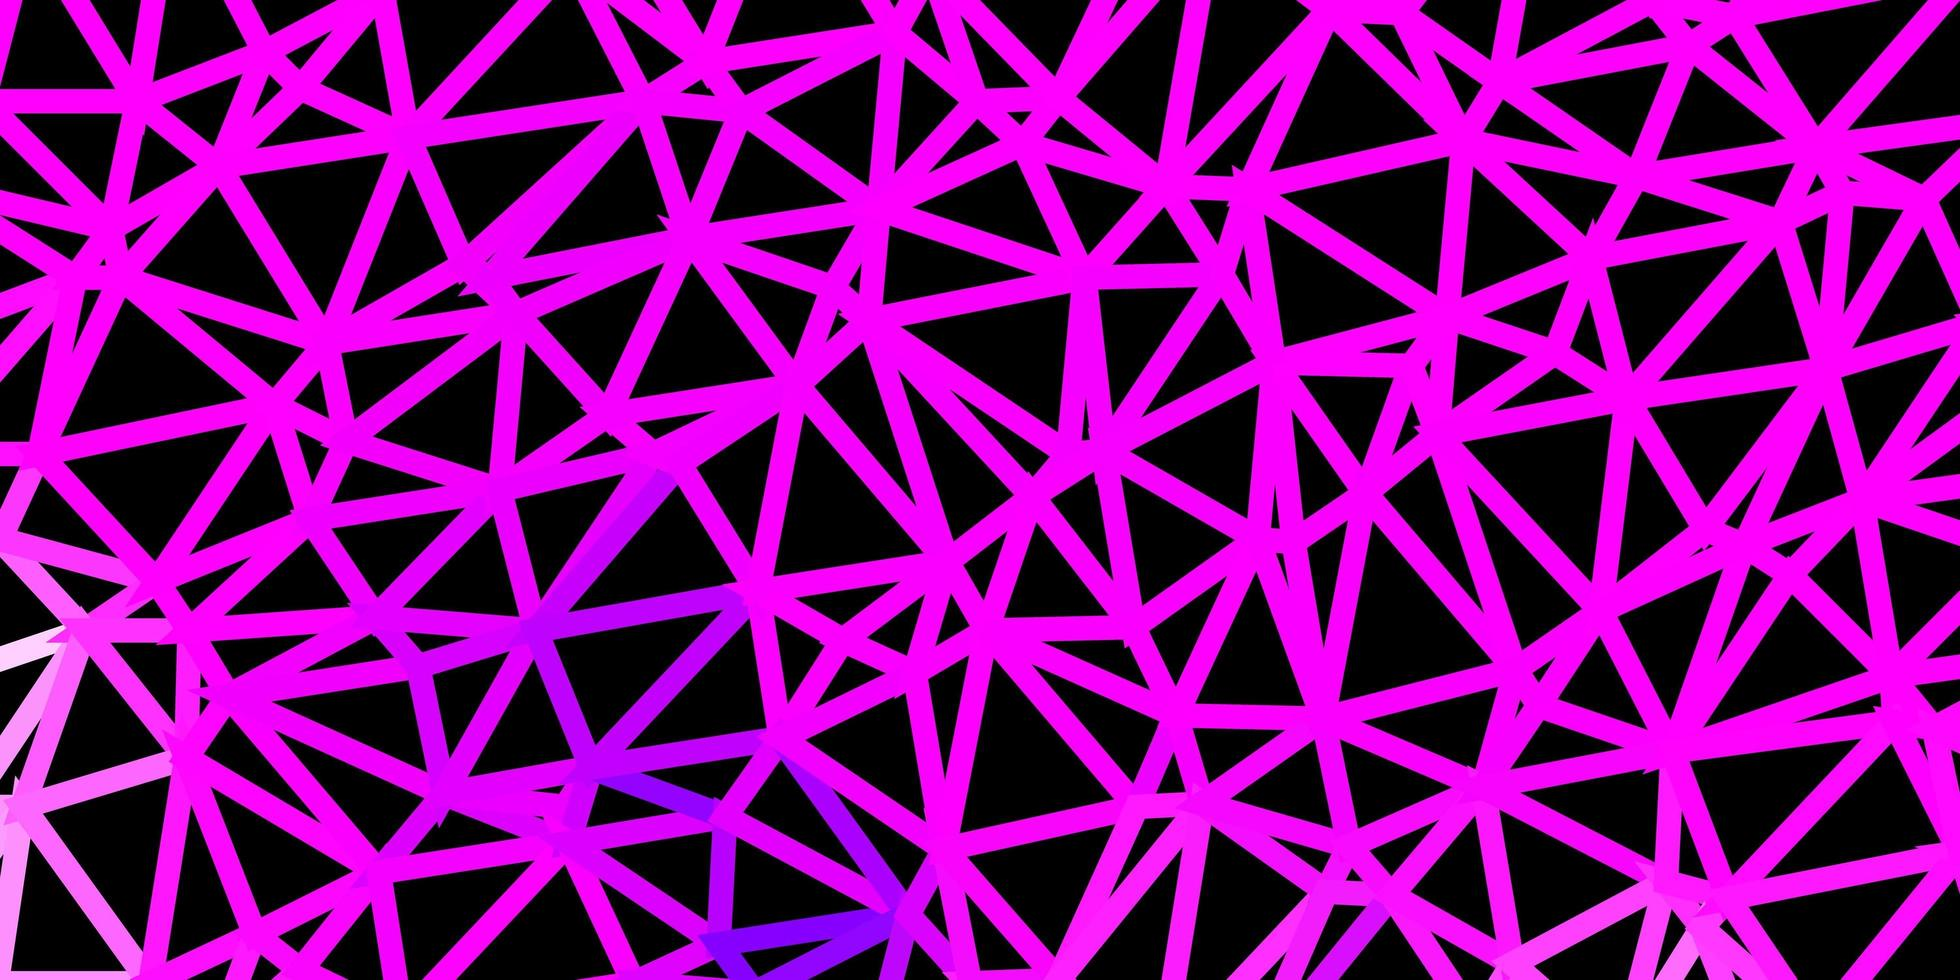 pano de fundo do mosaico do triângulo do vetor roxo claro.